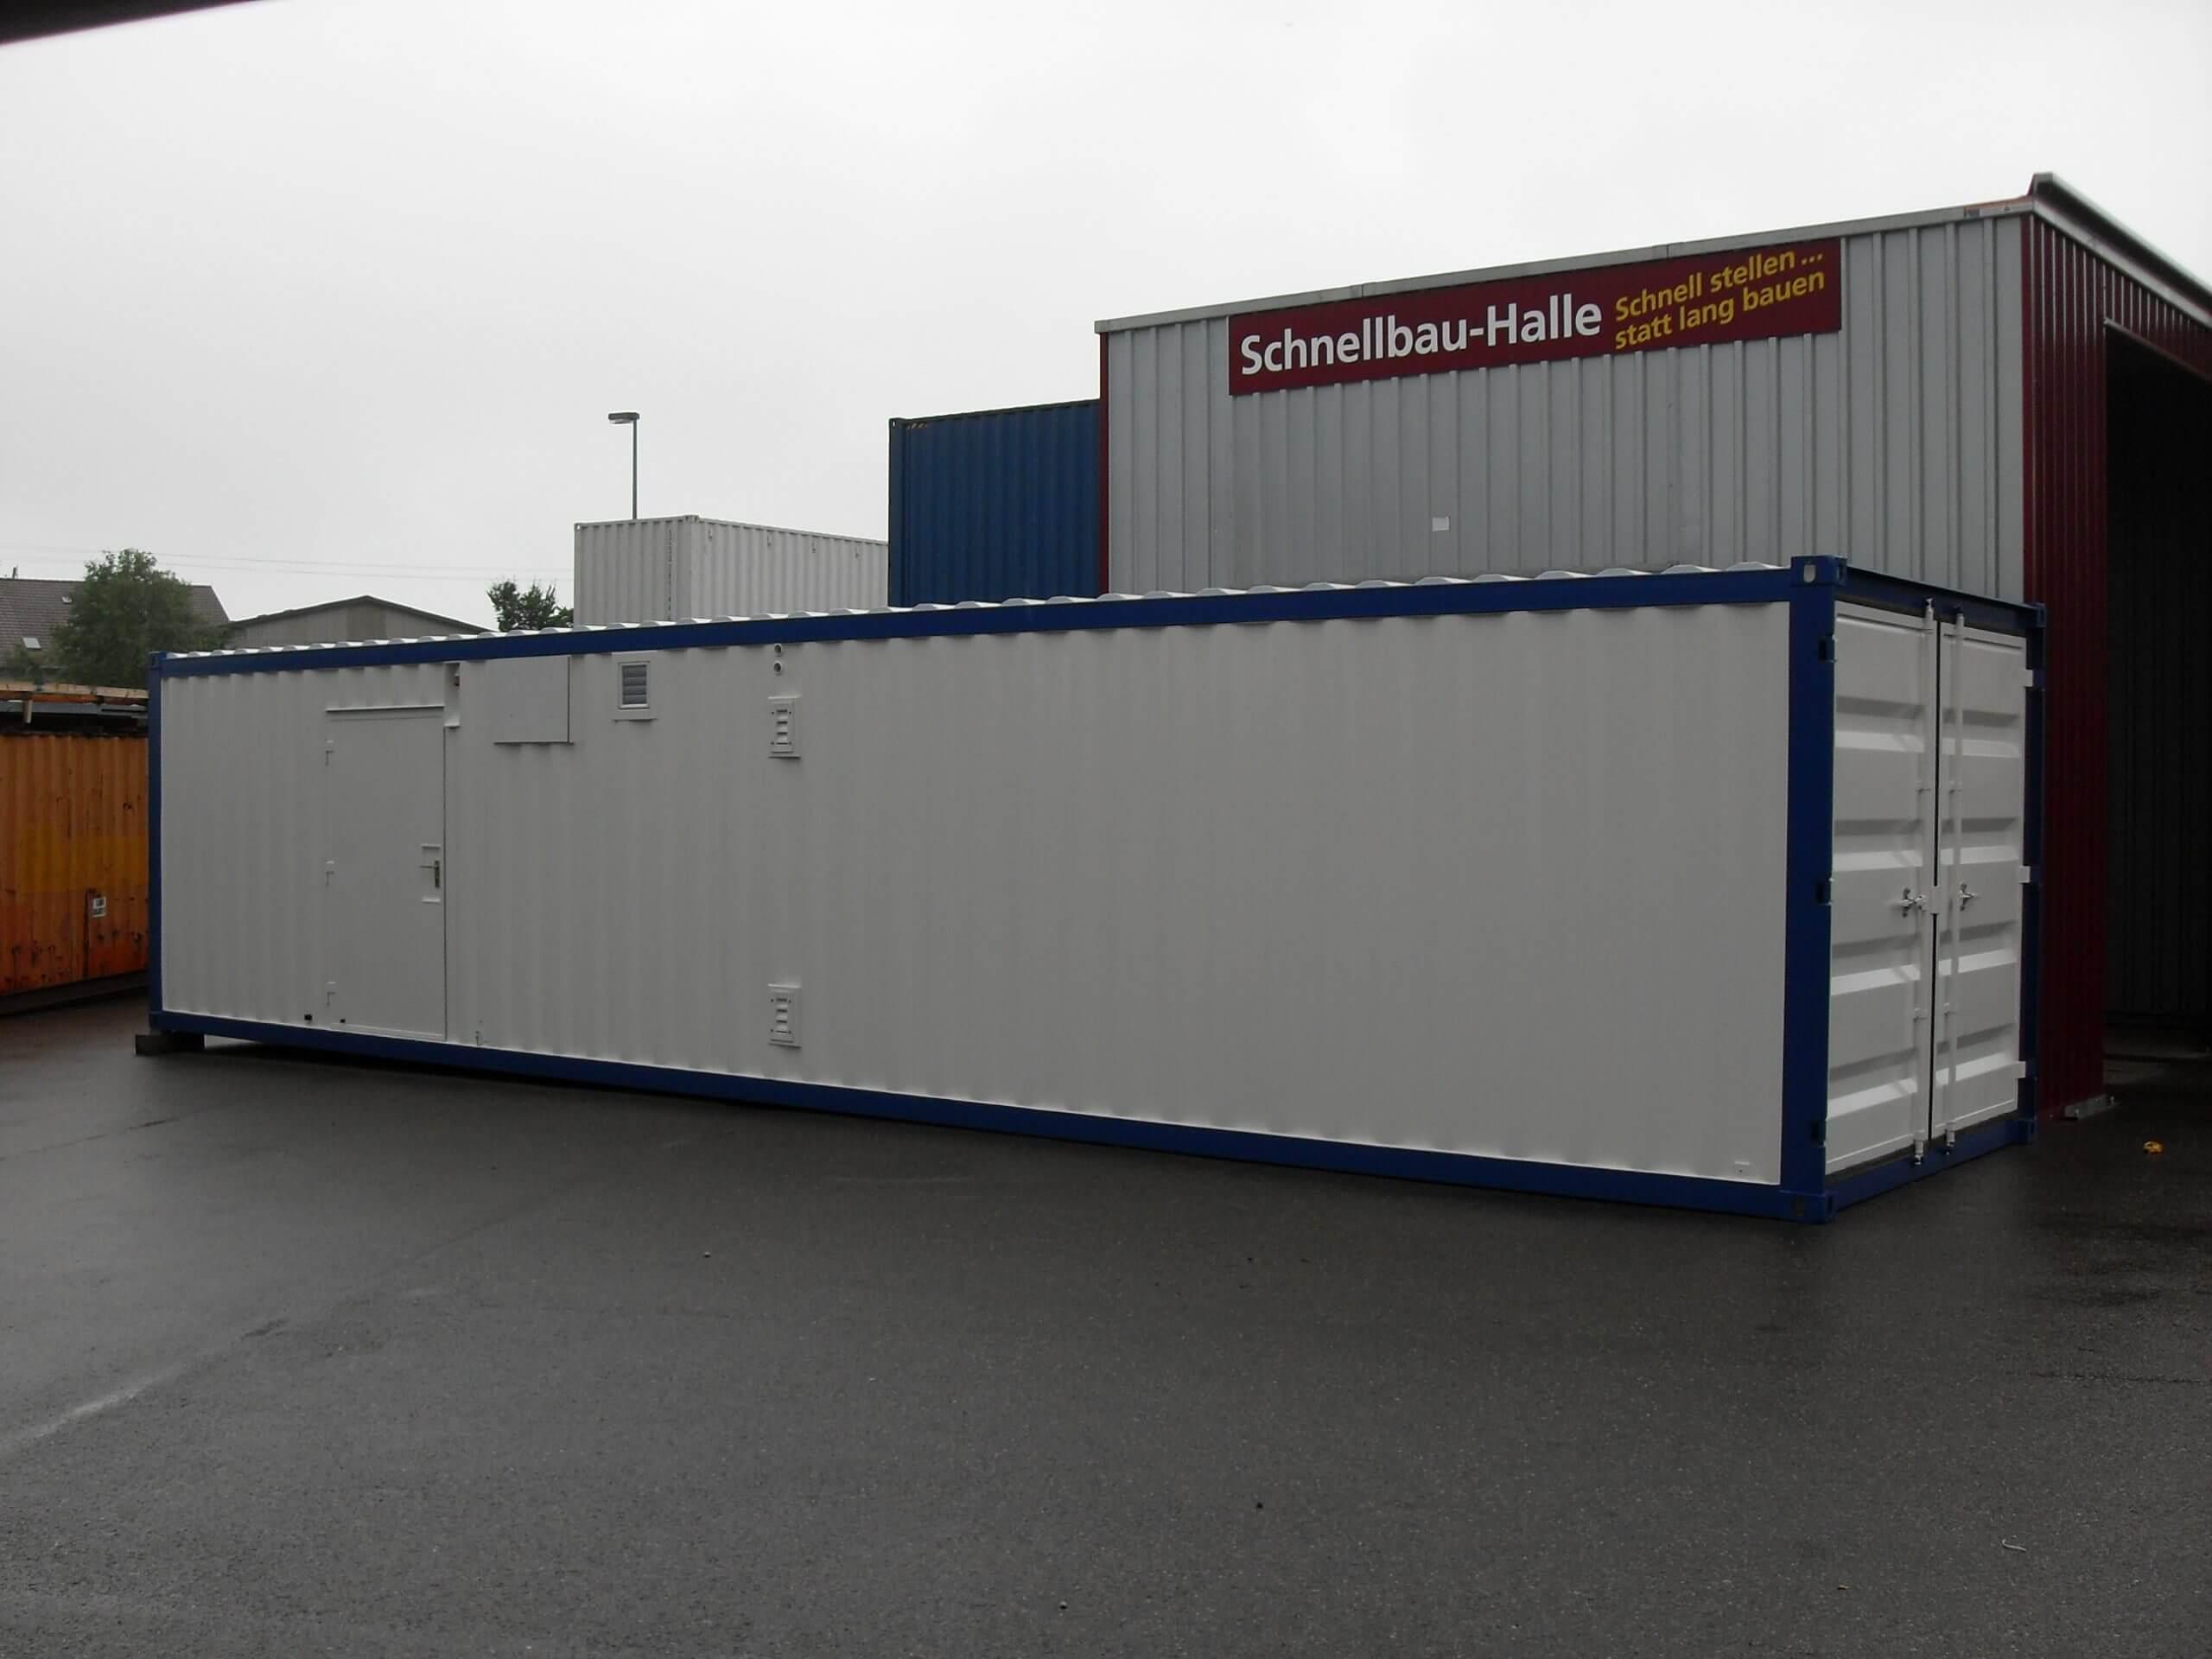 Container-mobile Notstromversorgung